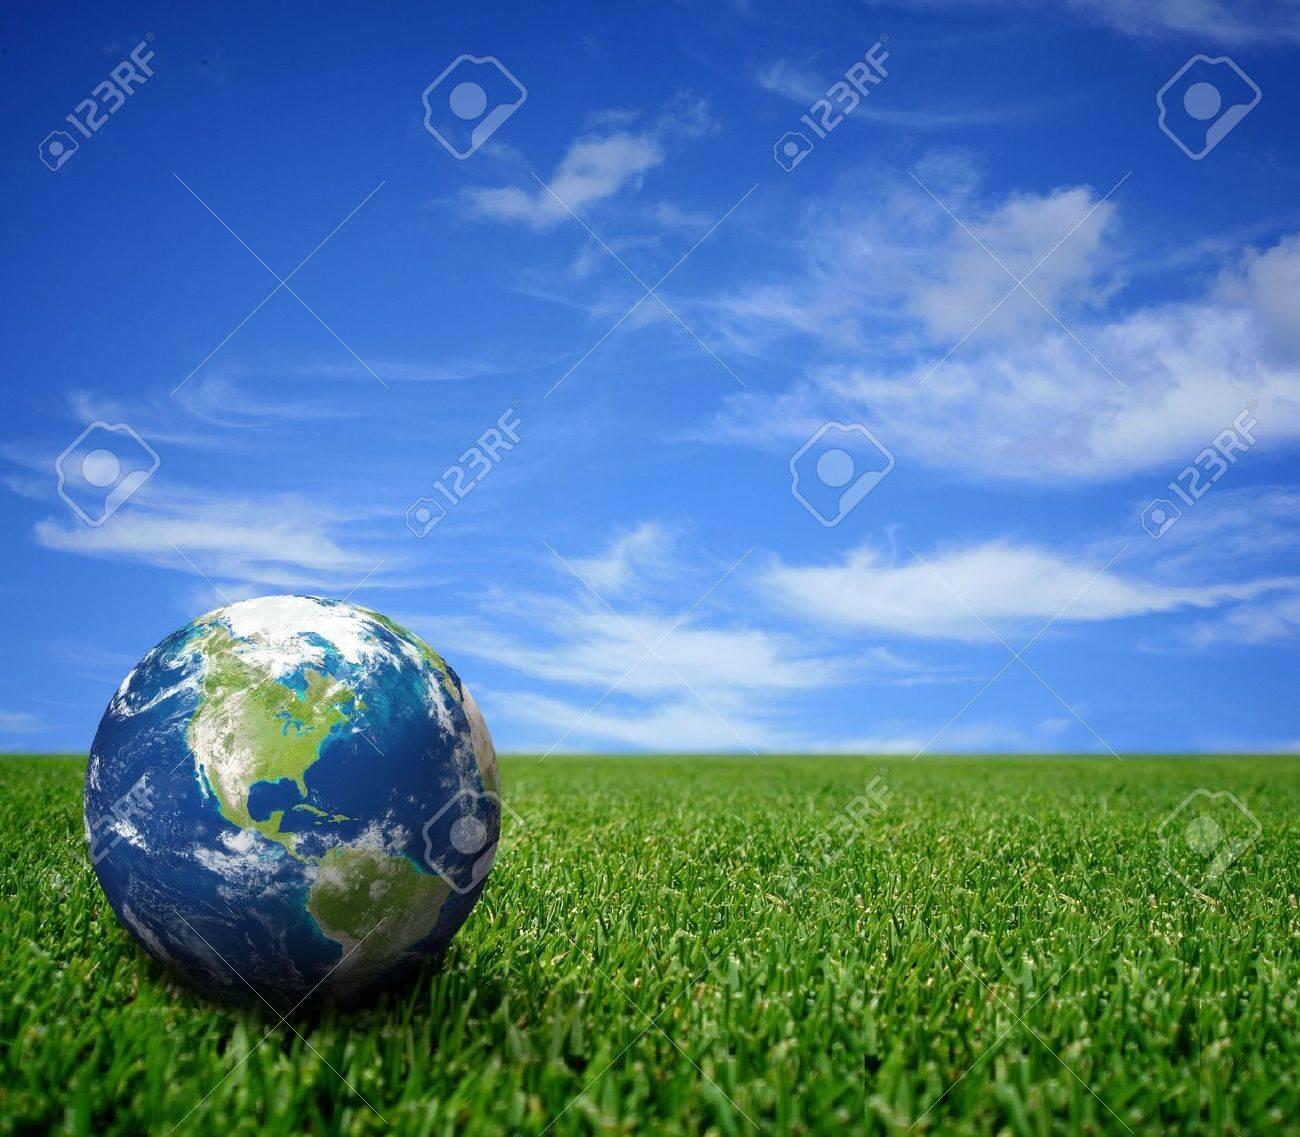 Landscape with globe - 5856059